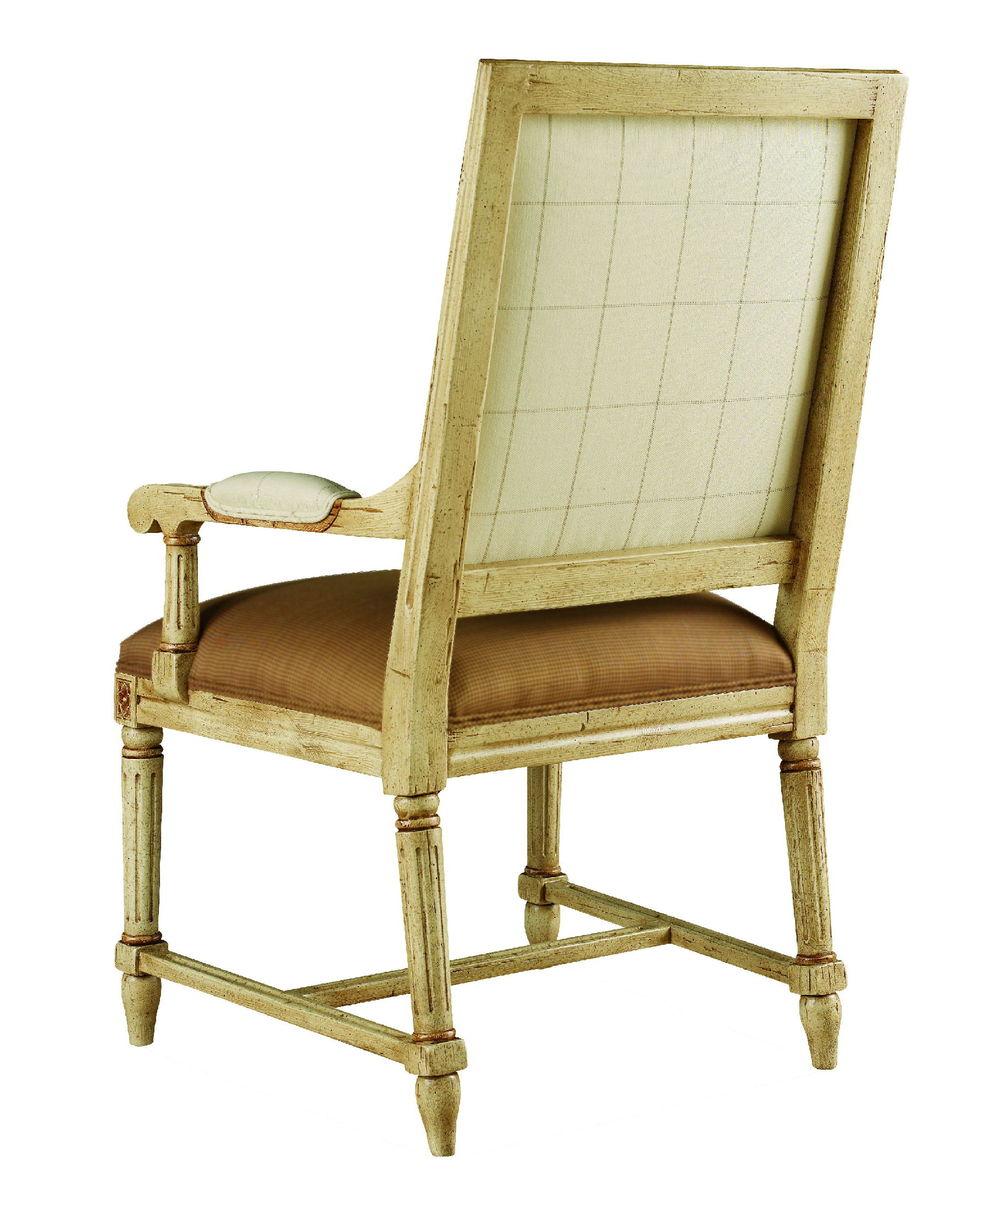 Chaddock - Durham Square High Back Arm Chair